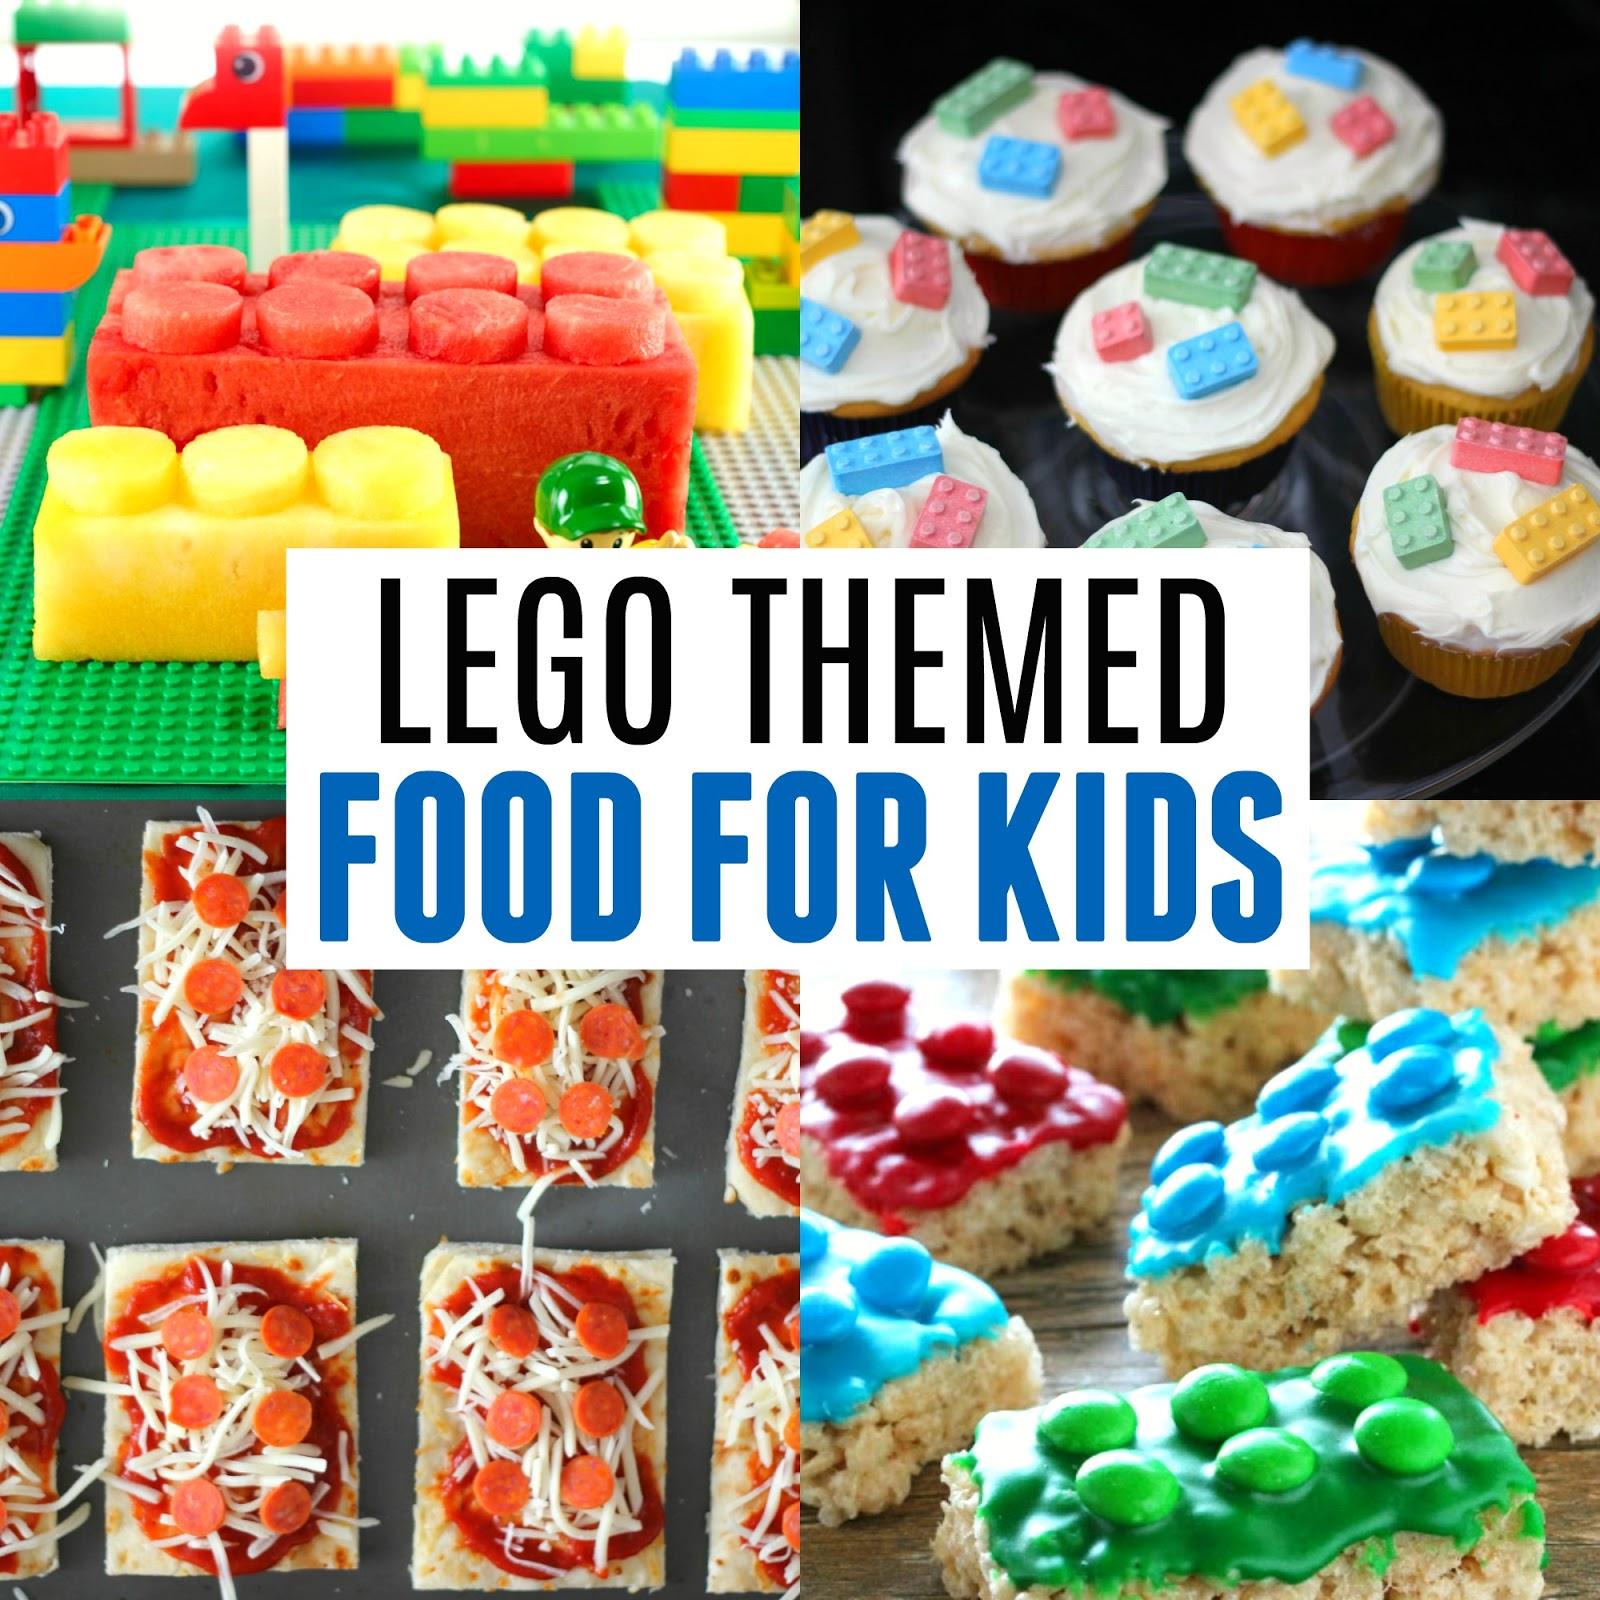 Pleasing Lego Birthday Cake Ideas Toddler Approved Easy Lego Brick Themed Funny Birthday Cards Online Fluifree Goldxyz